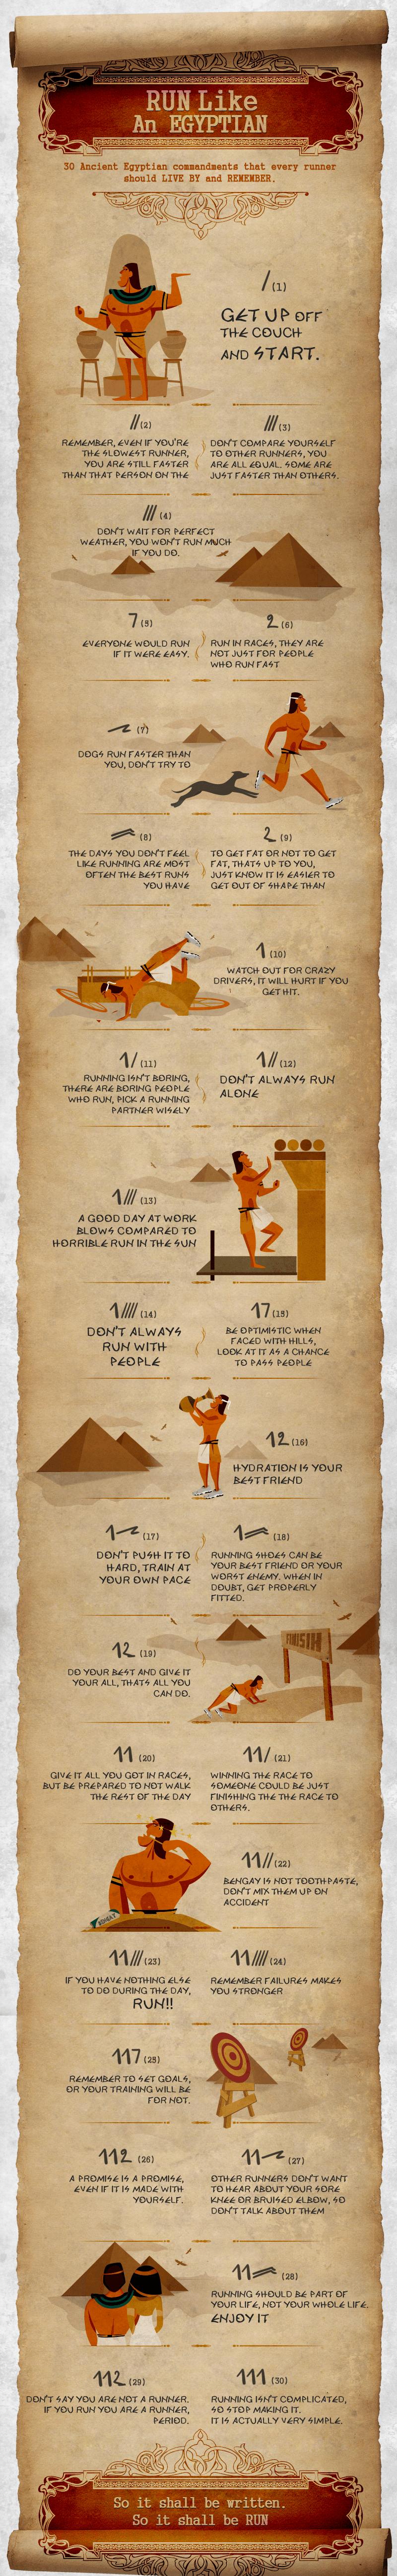 Run Like An Egyptian Infographic